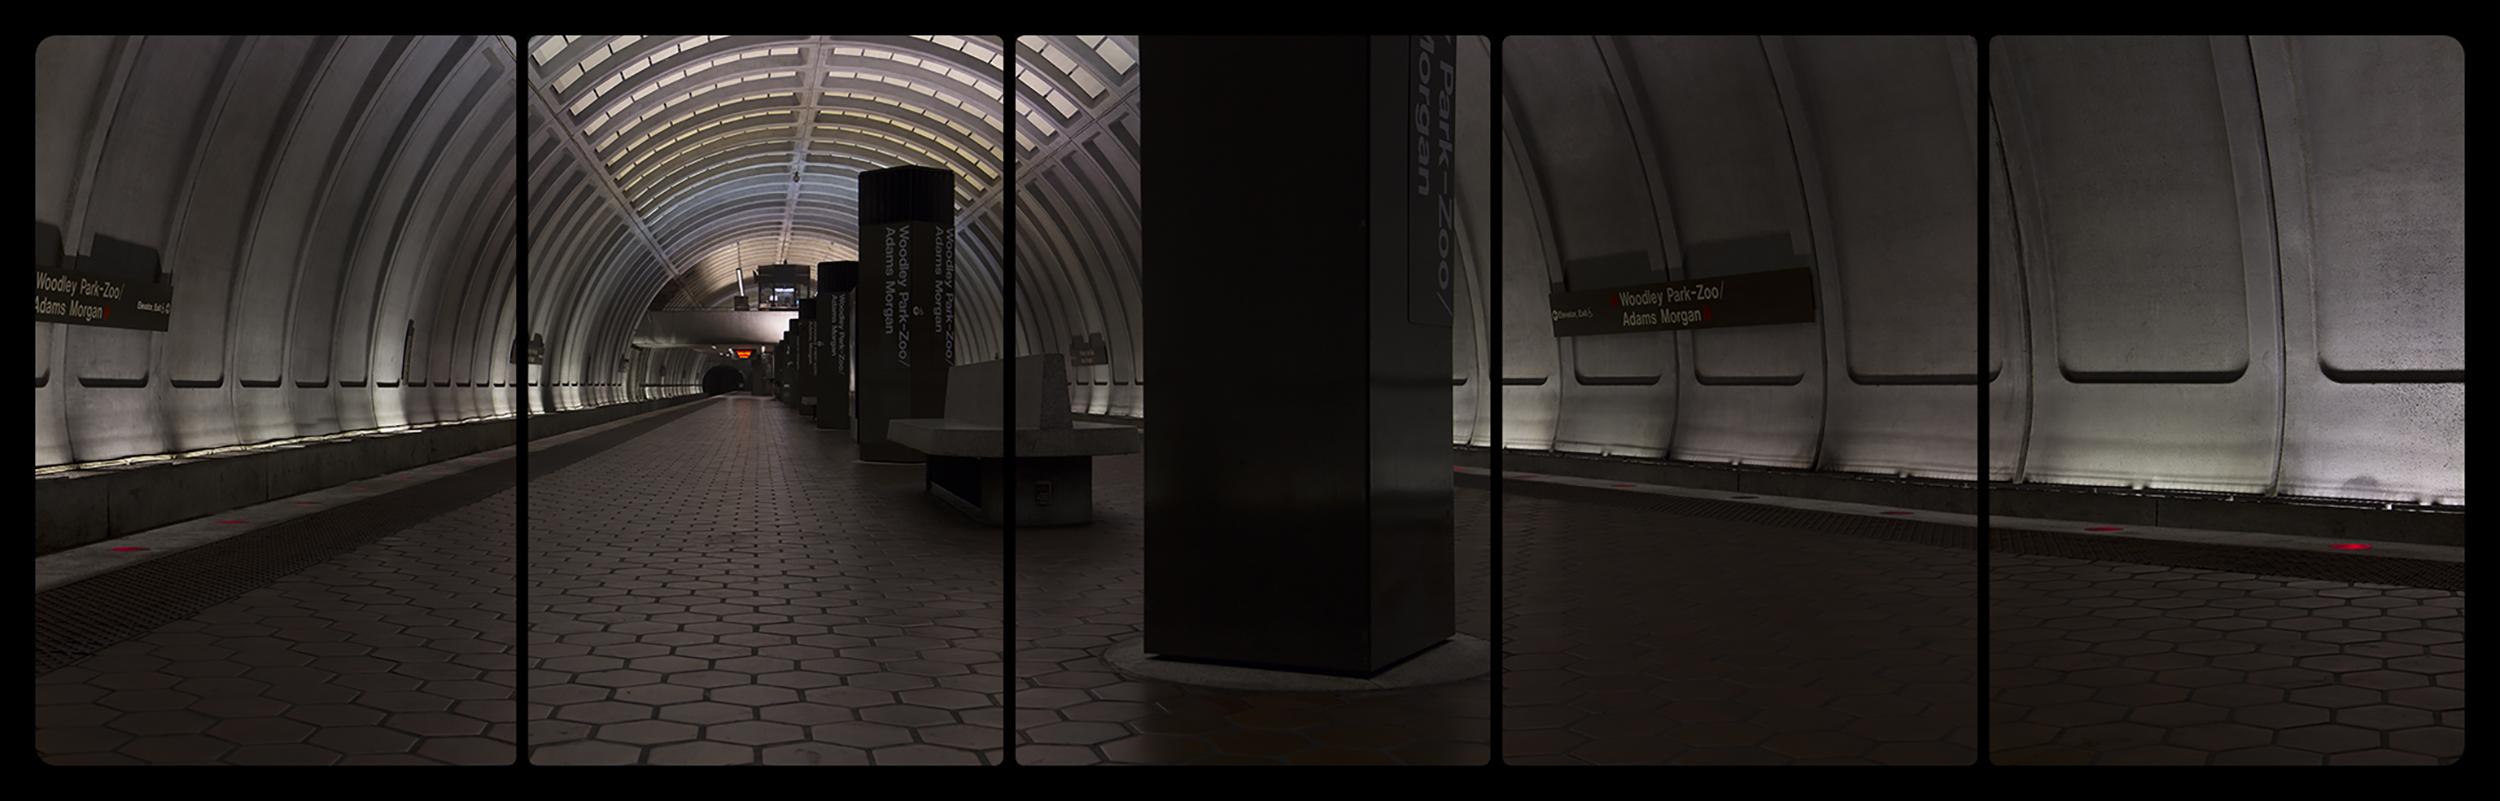 Metro Rail, Woodley Park-Zoo,6-15-2014,2651-2657